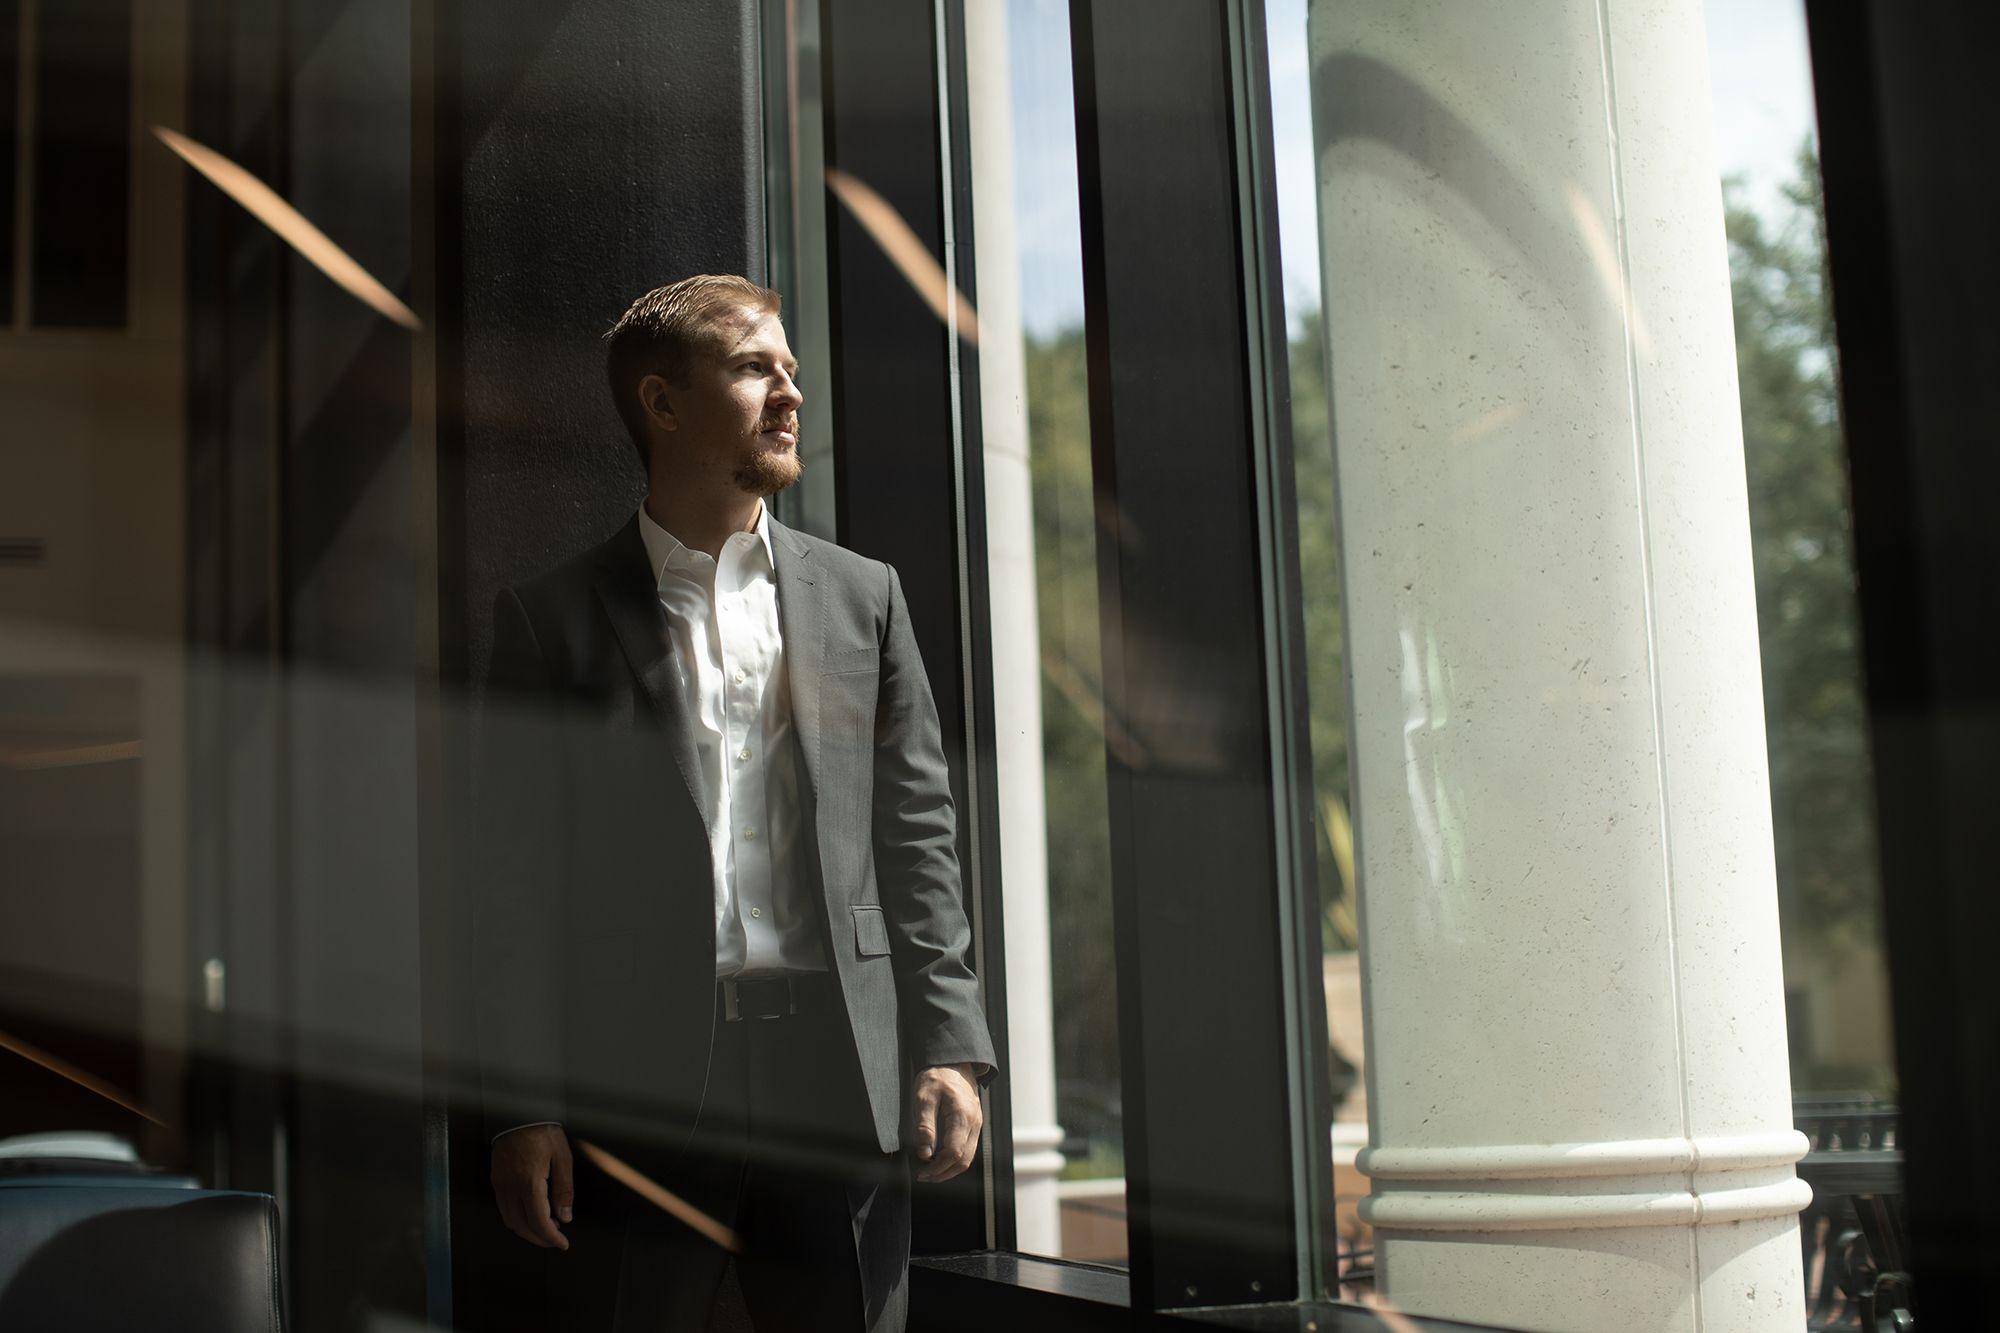 Caleb Archuleta gazes out a window in the Bush Science Center.